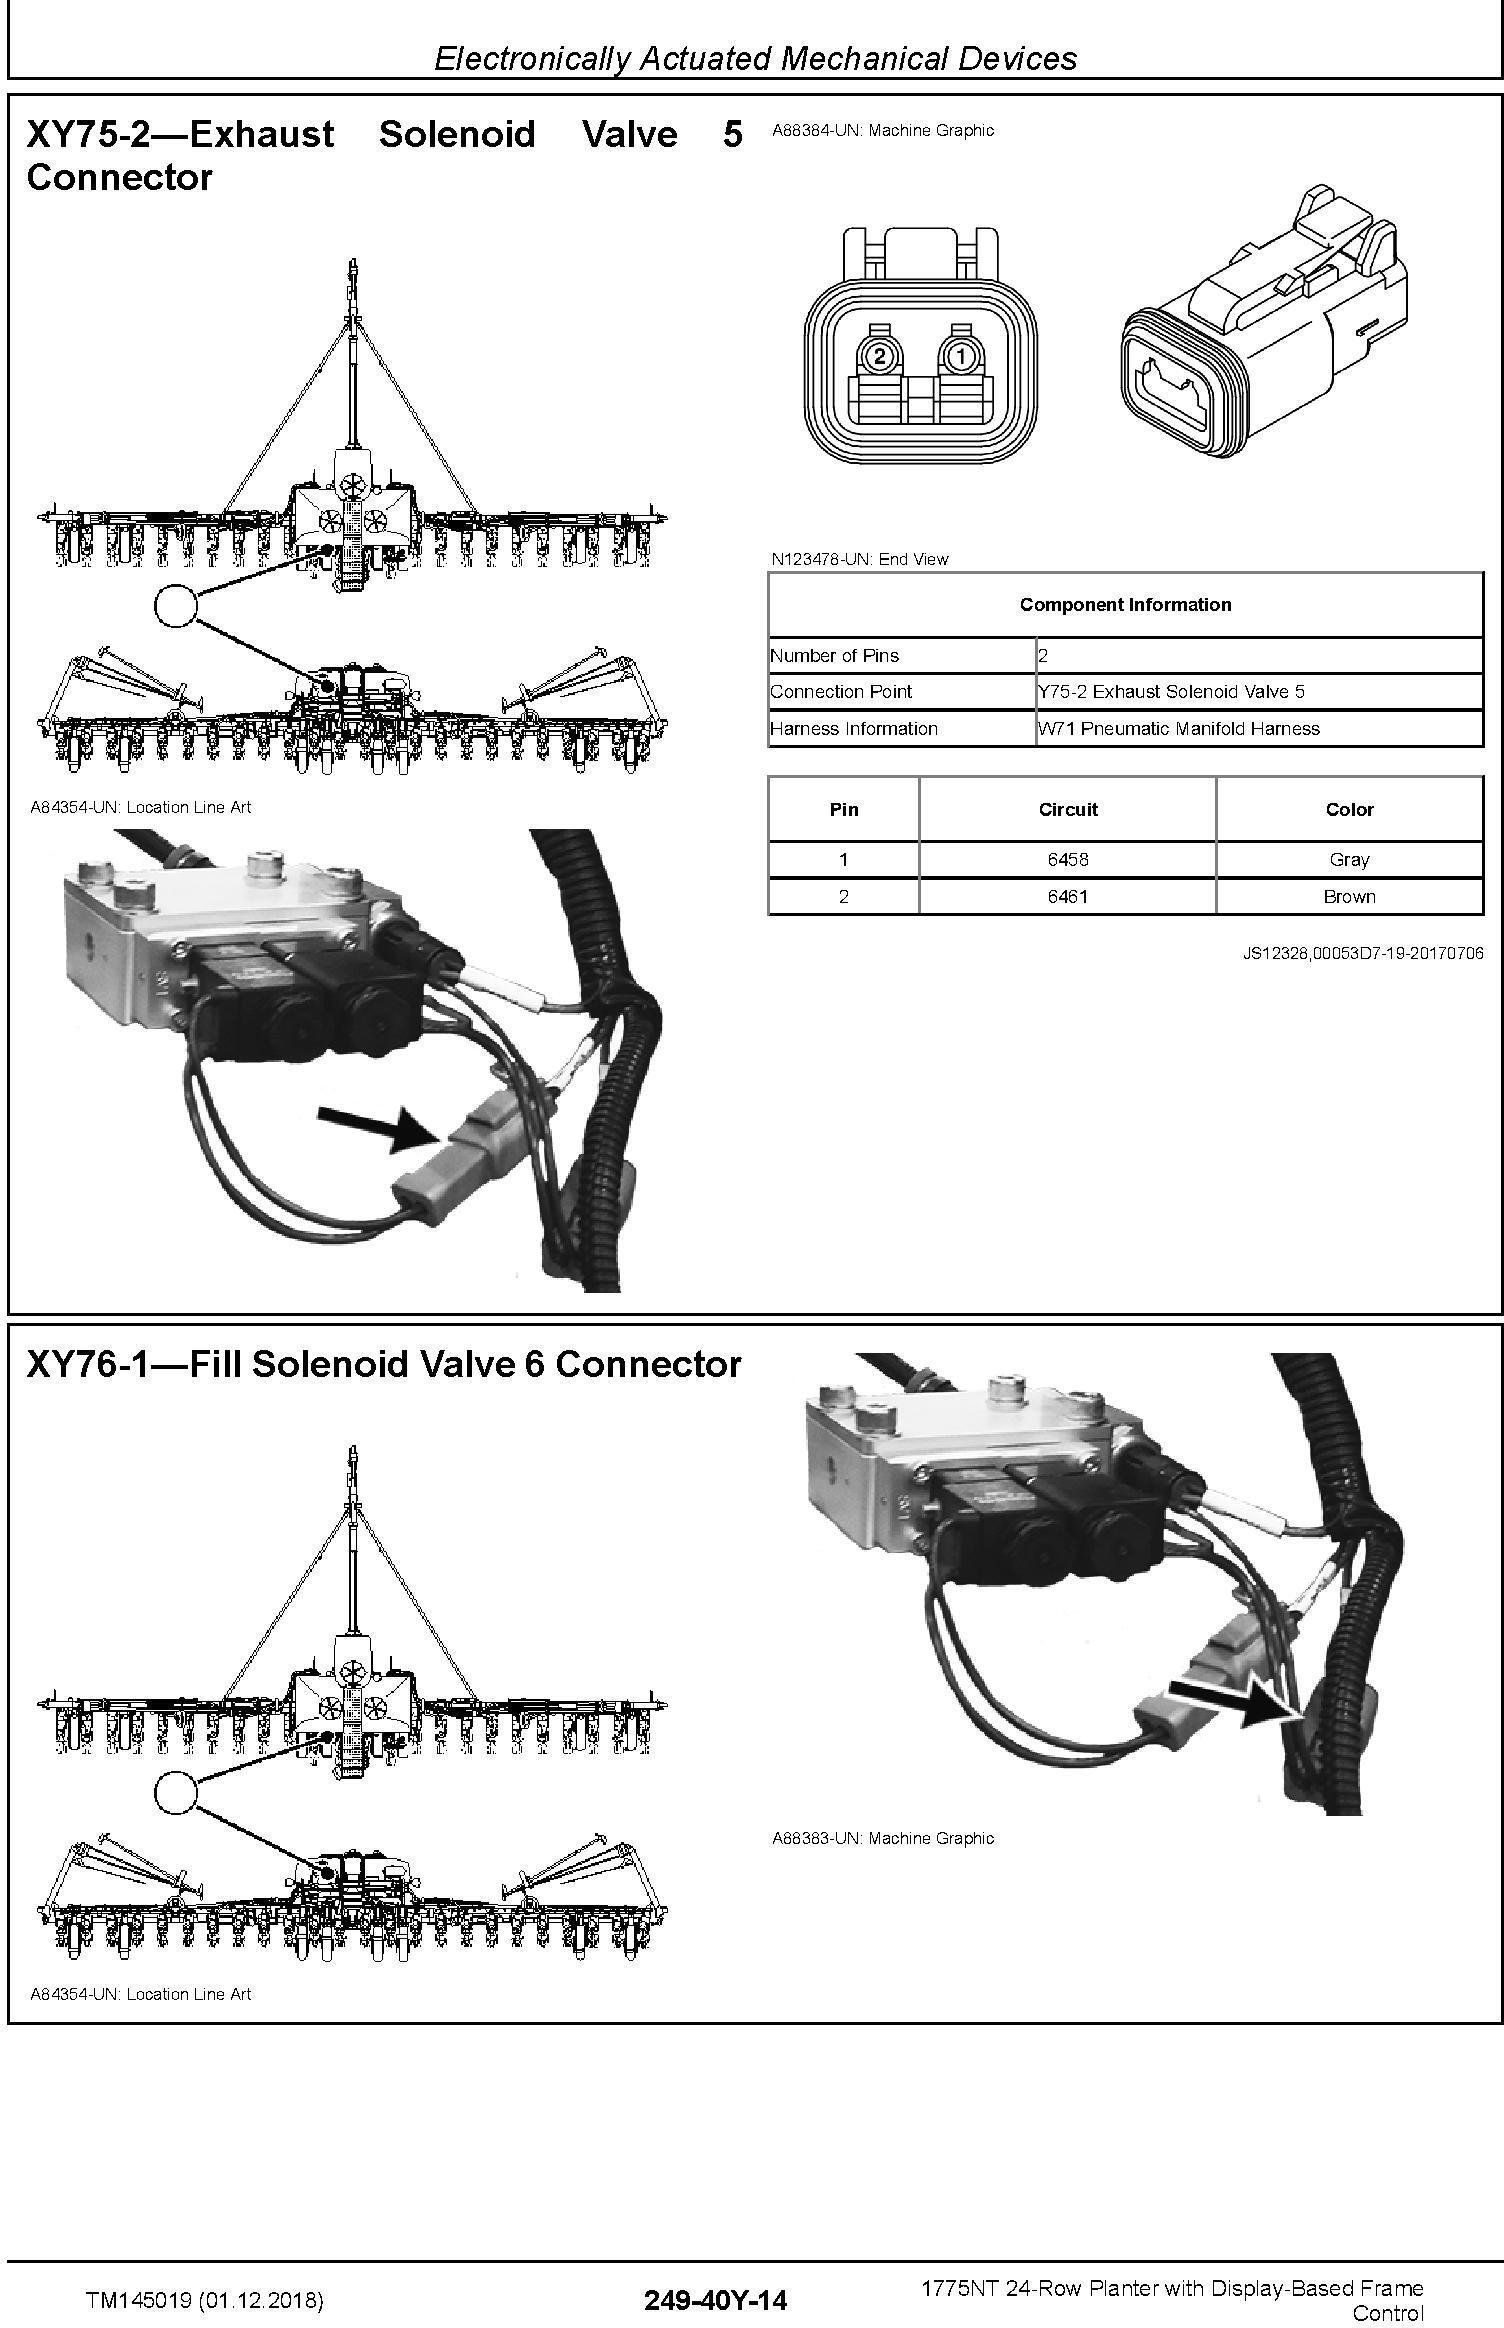 John Deere 1775NT 24row Planter w.Display-Based Frame Control Diagnostic Technical Manual (TM145019) - 2